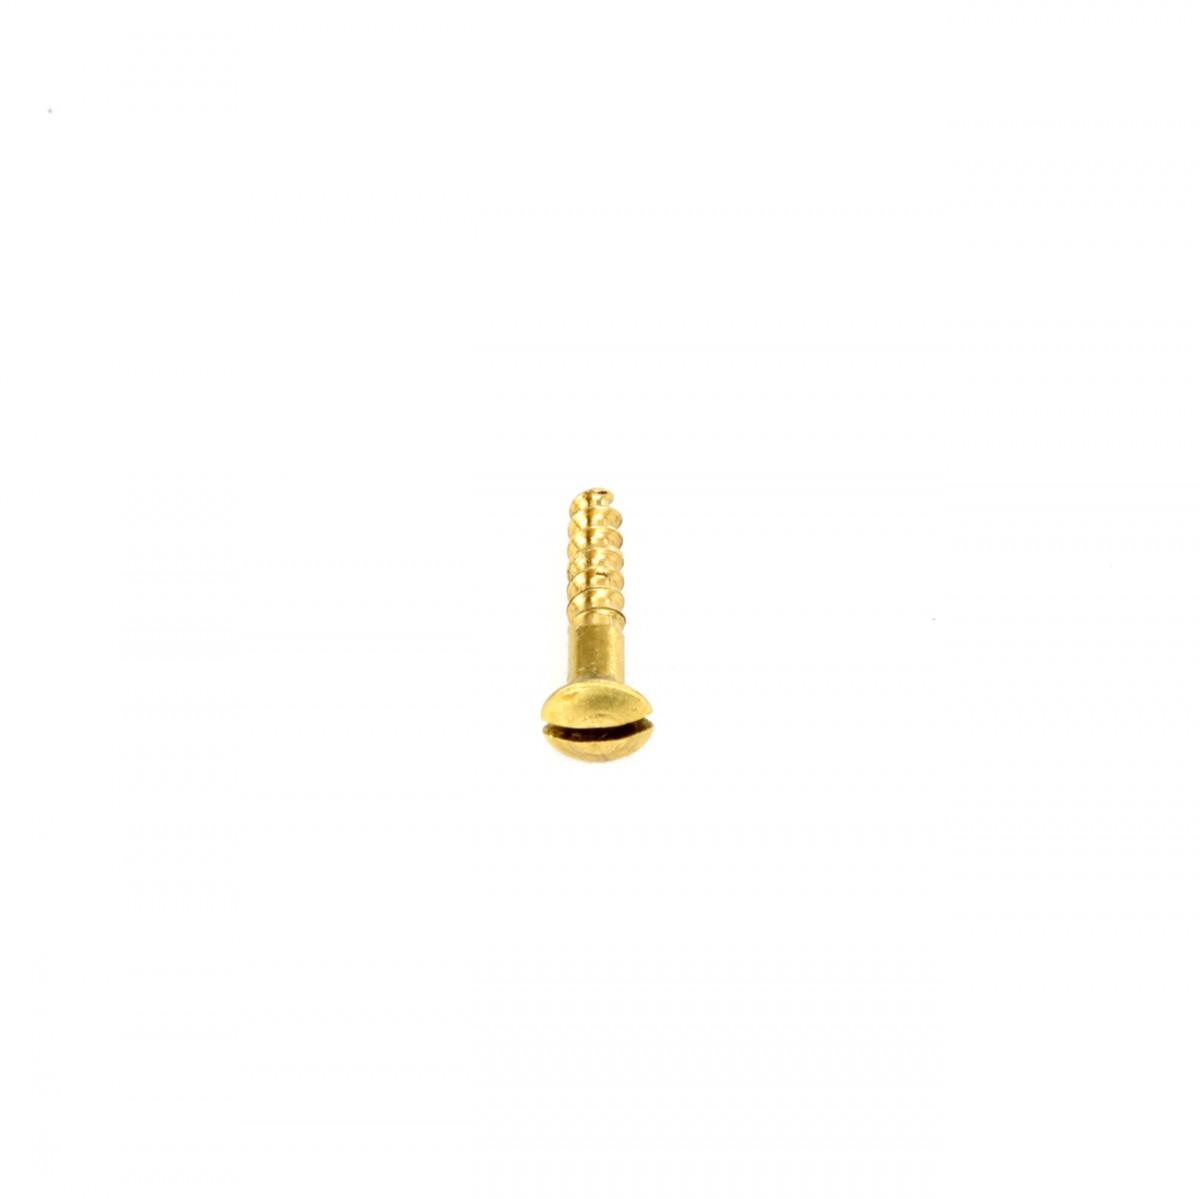 Brass Oval Head Wood Screws # 6 34 Qty 25 Screws Oval Head Wood Screws Brass Screws